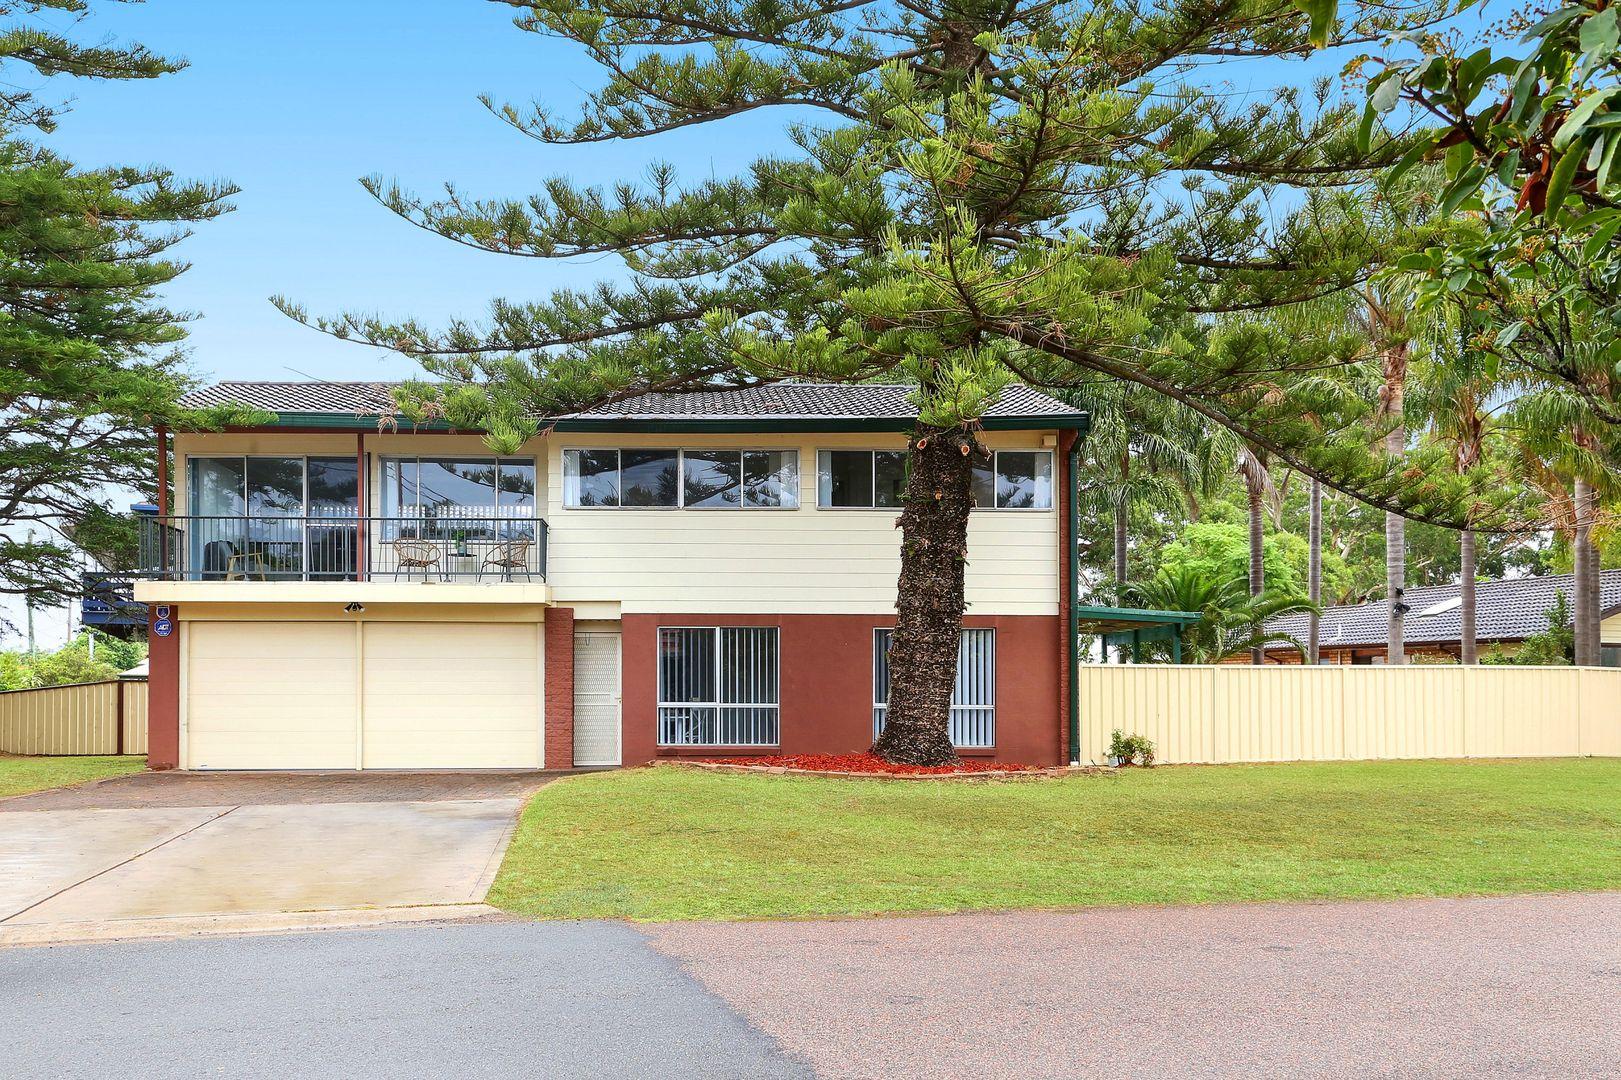 63 Springwood Street, Ettalong Beach NSW 2257, Image 0